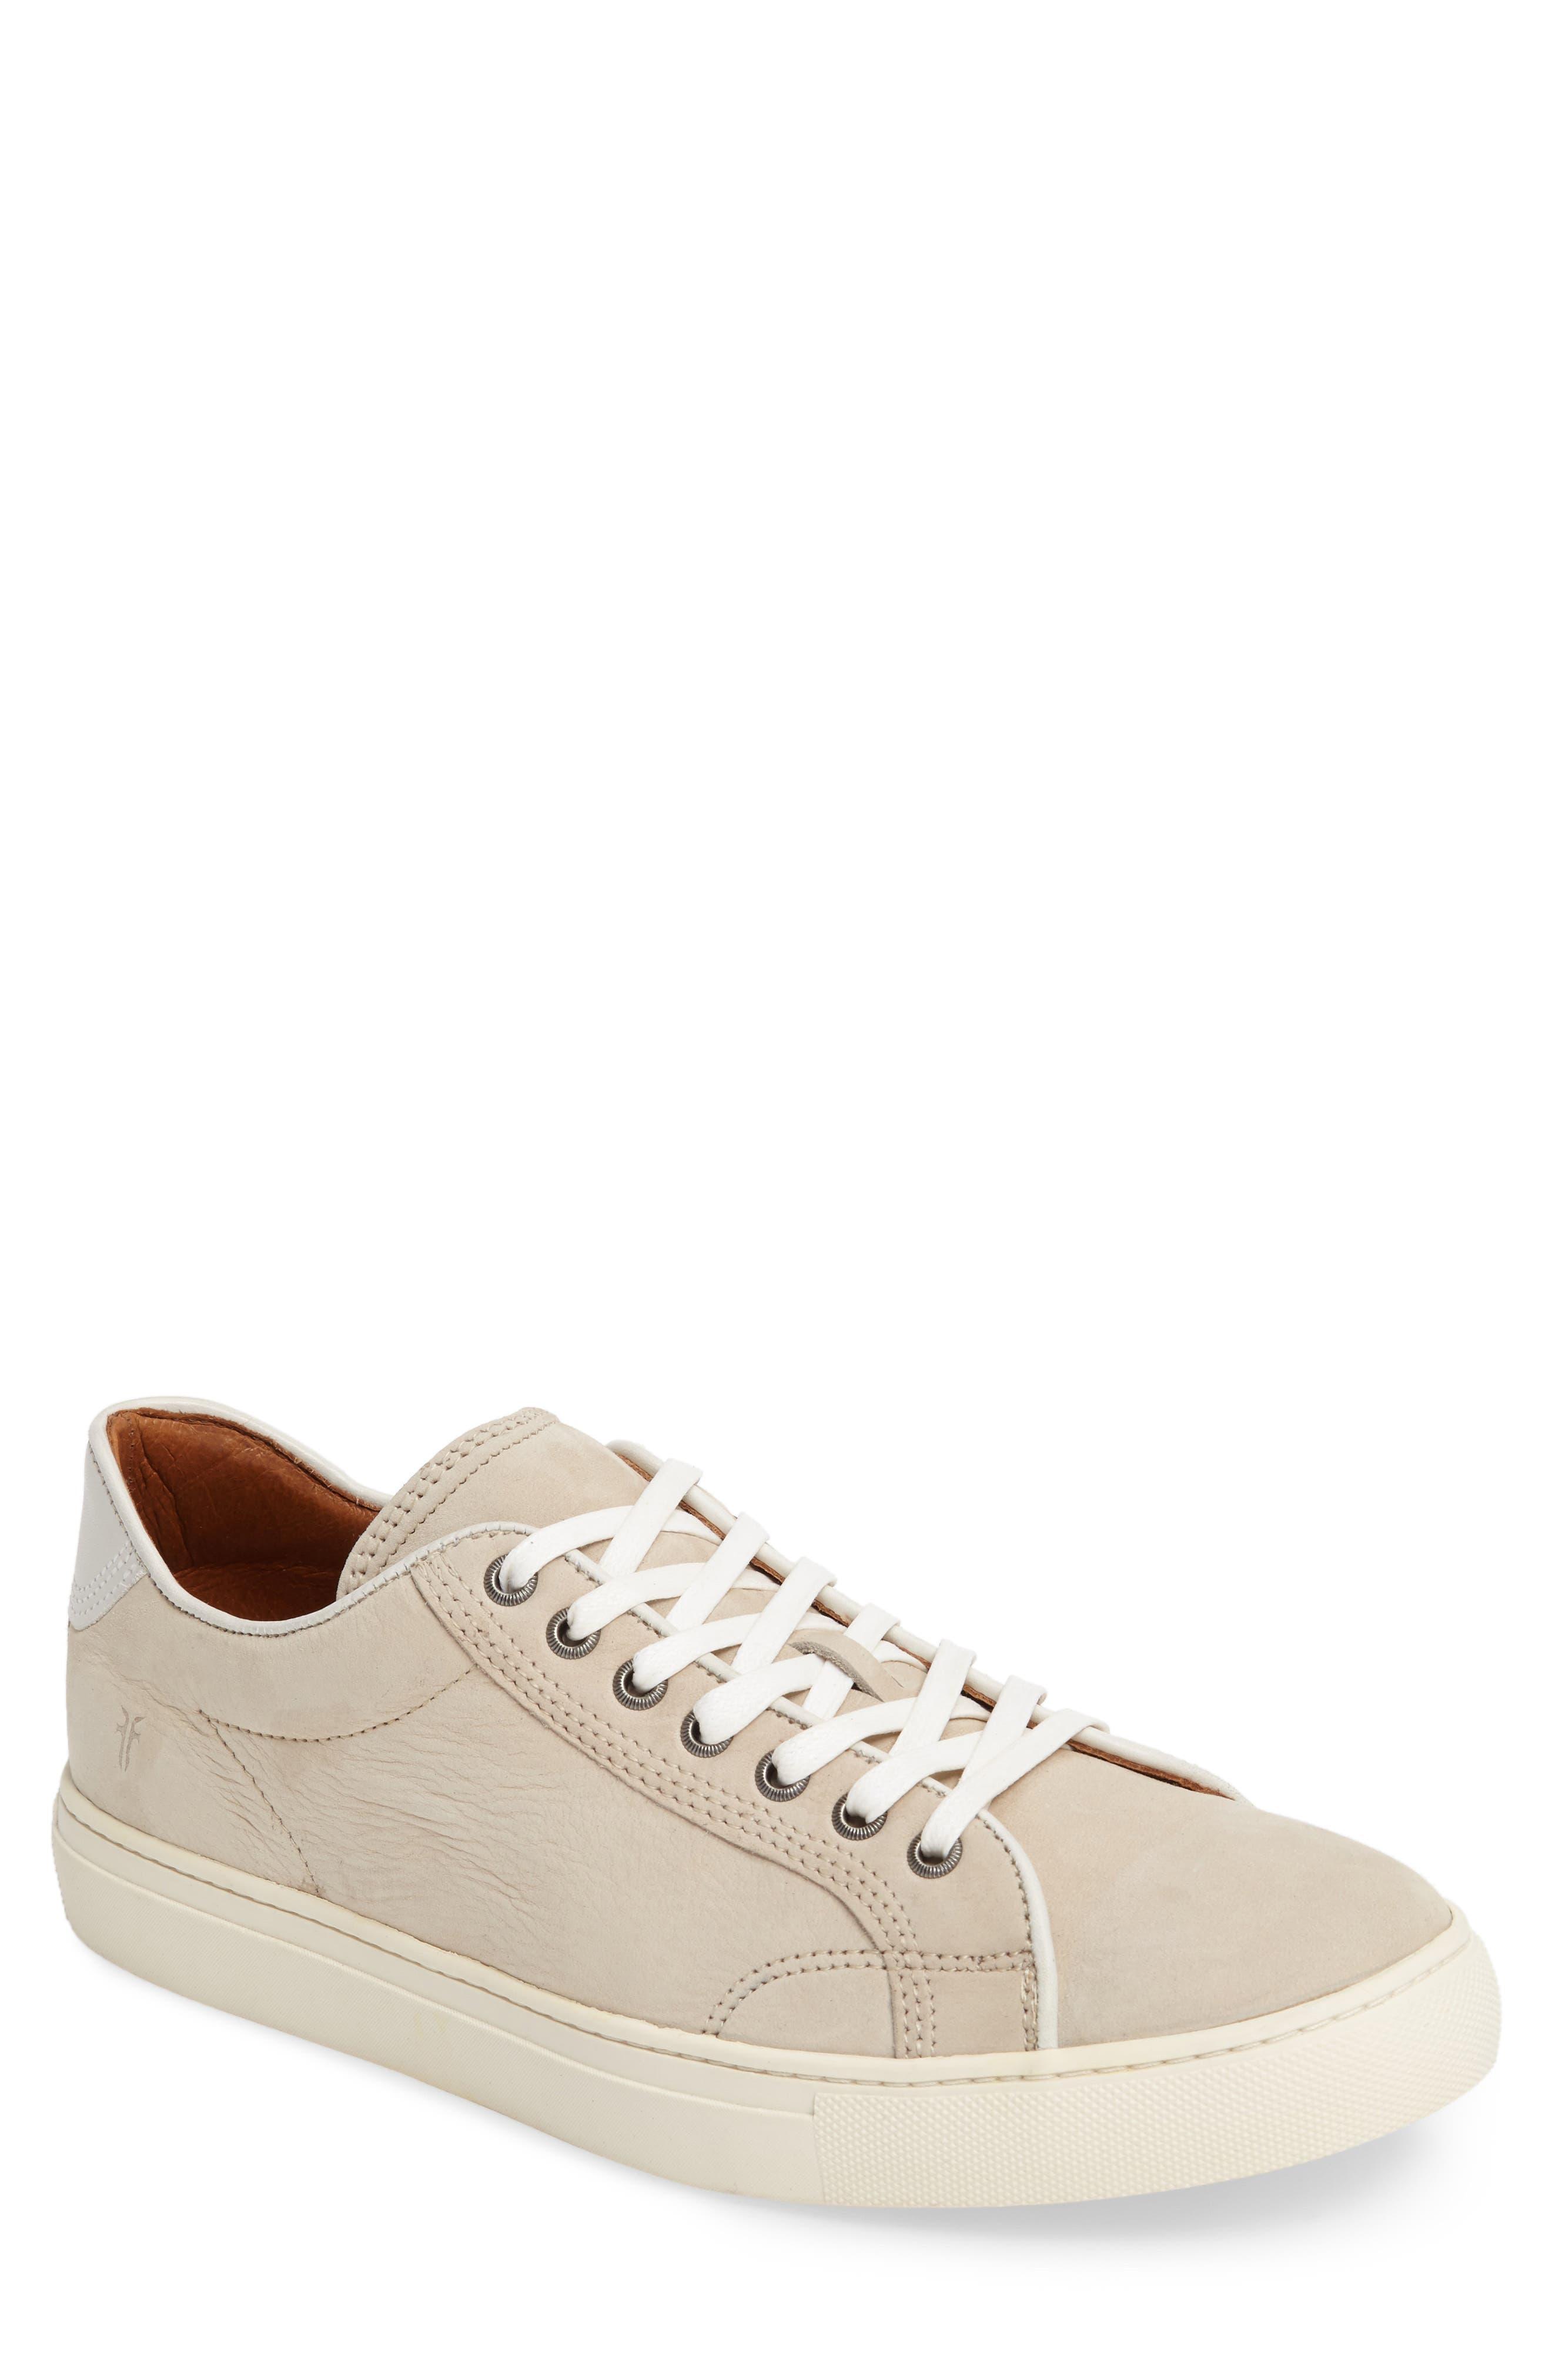 Walker Low Top Sneaker,                             Main thumbnail 1, color,                             Ivory